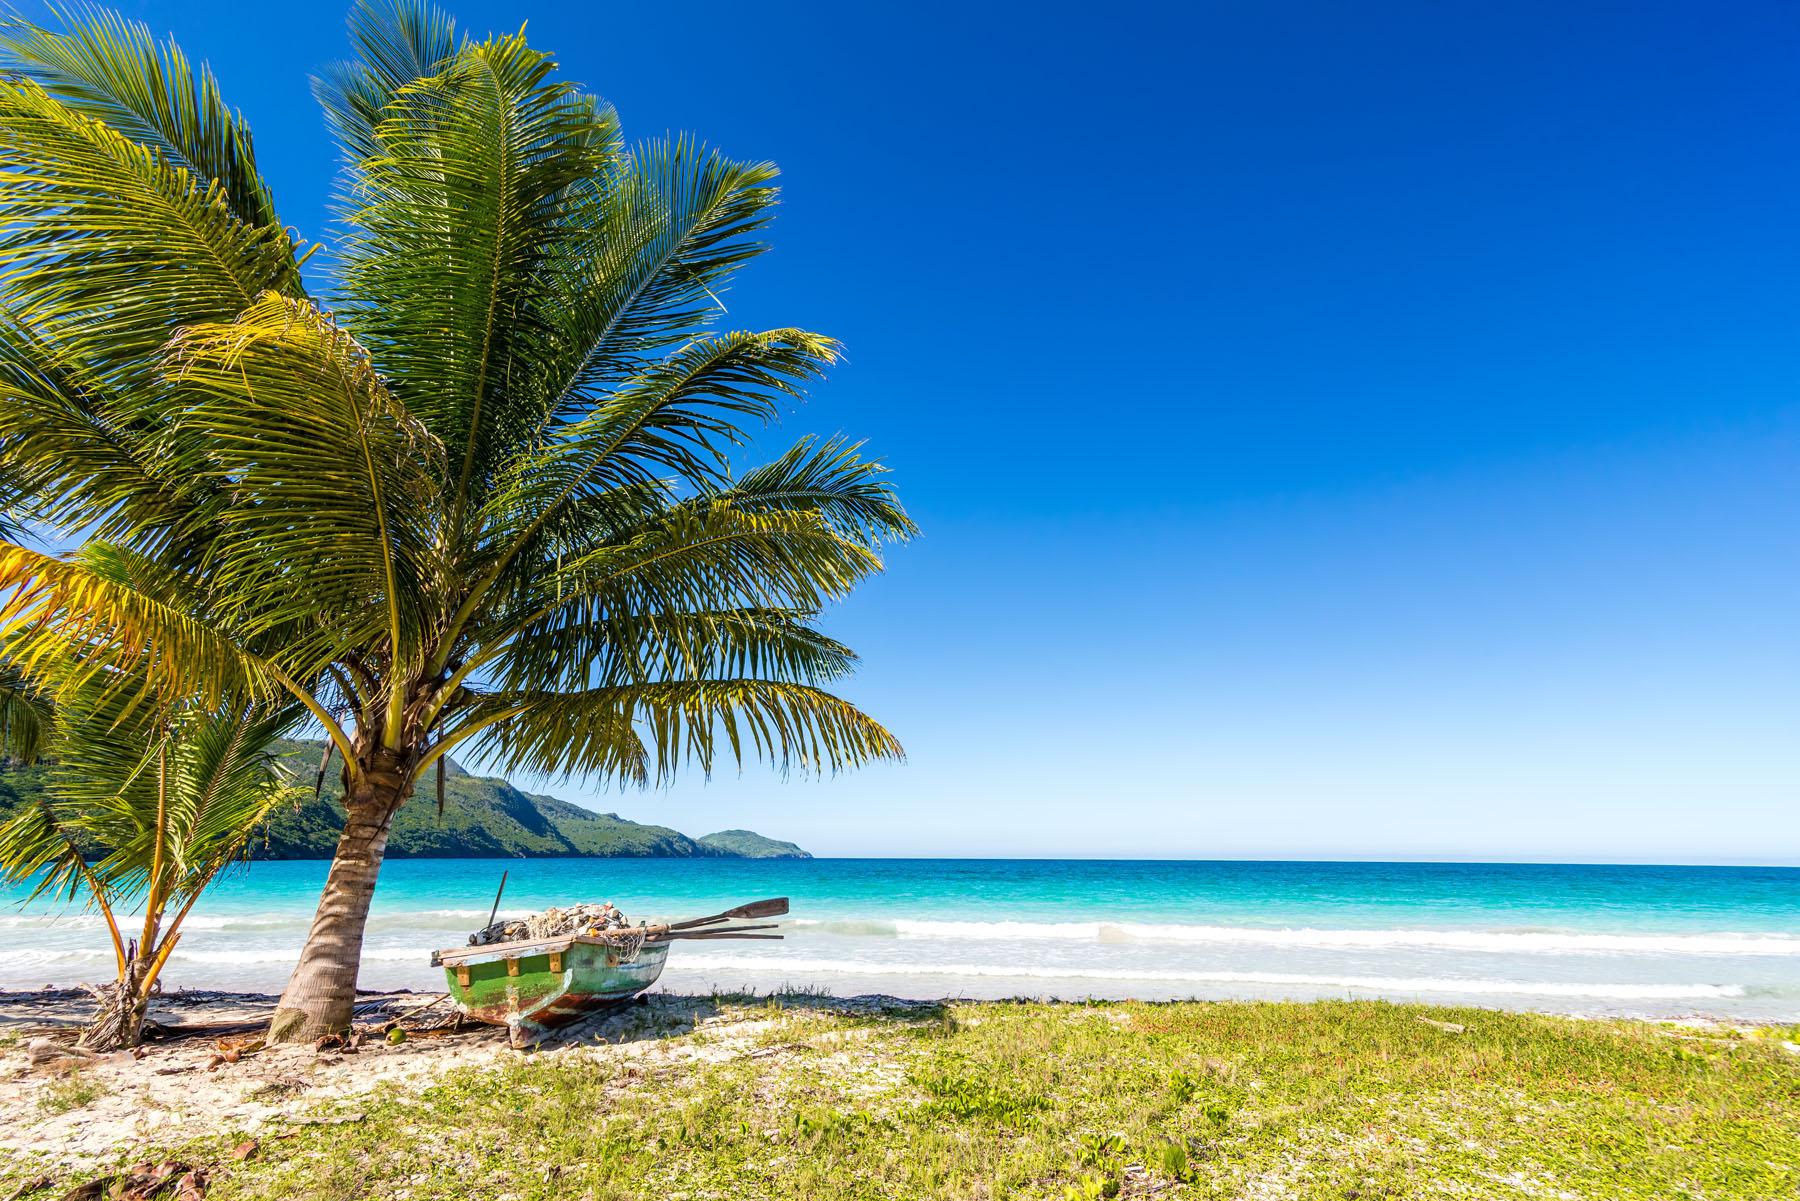 Dominican-Playa Rincon_219185569